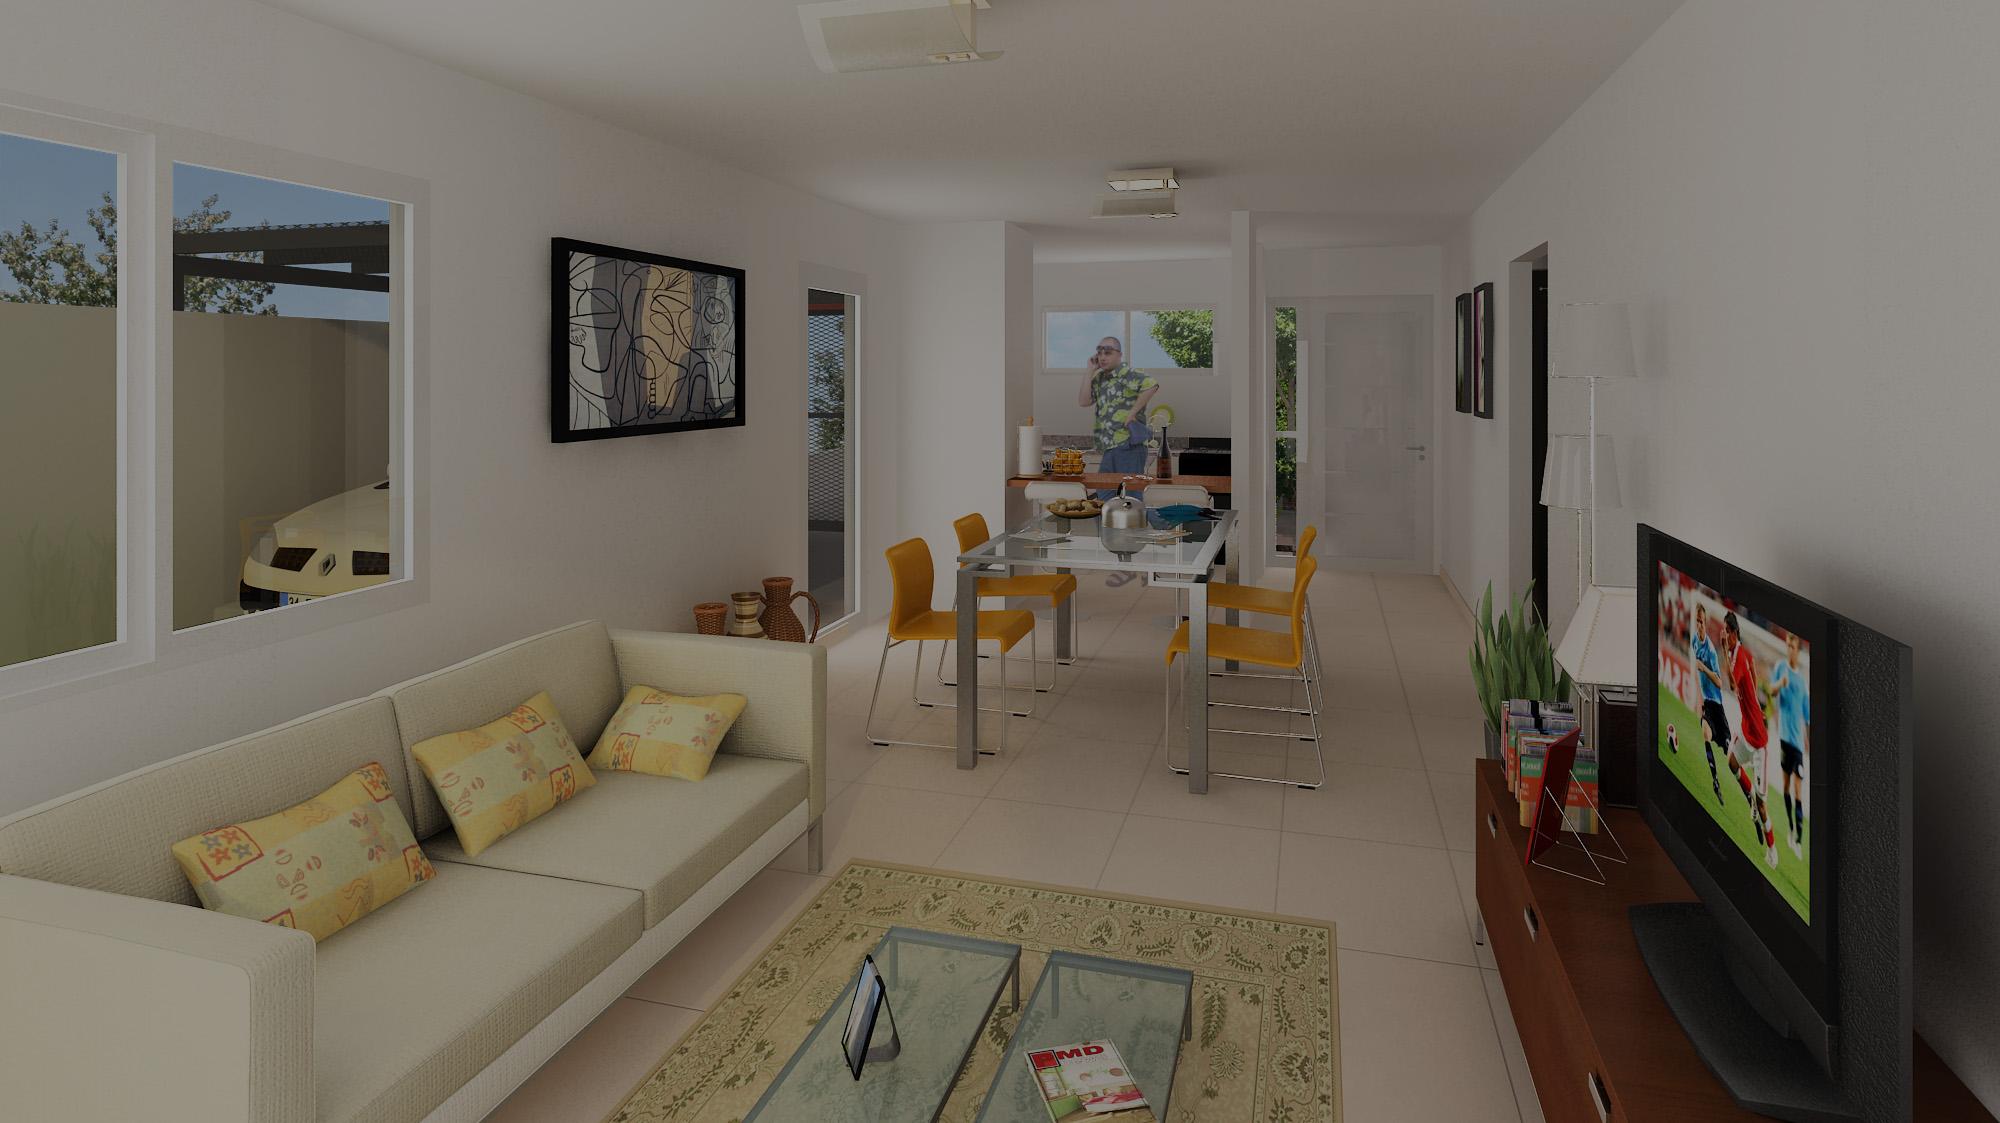 Inicio vivienda joven steel framing for Modelos viviendas procrear